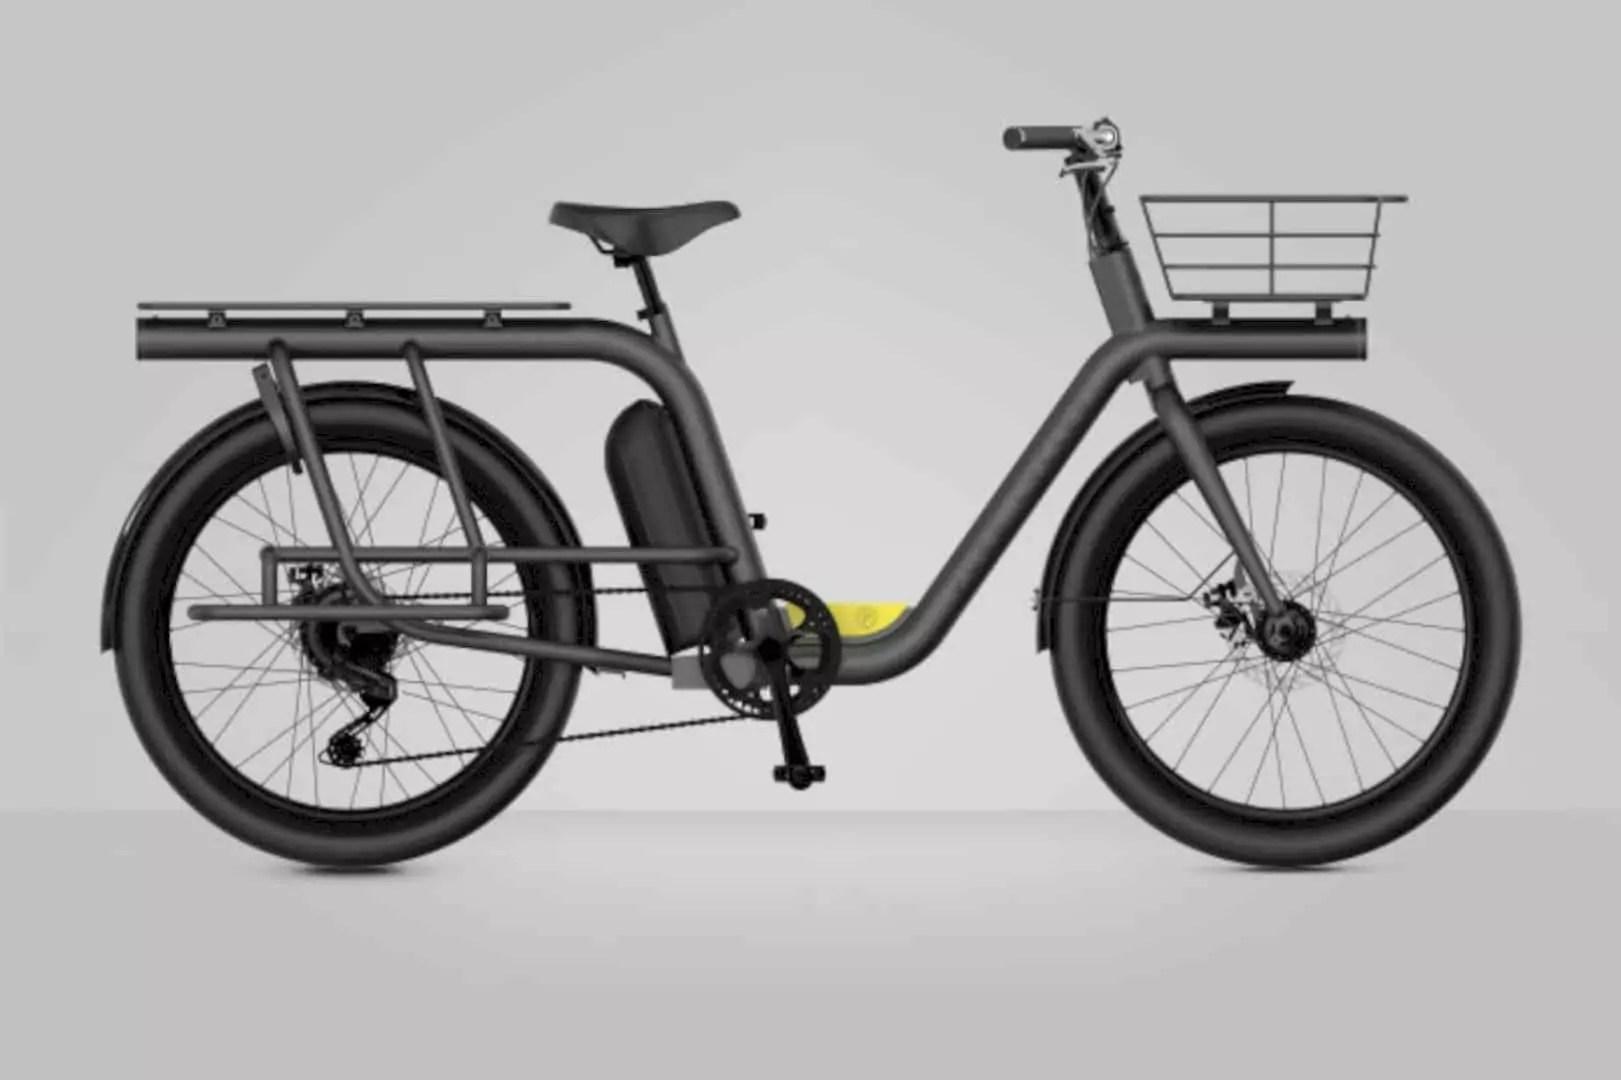 Capacita: The Smart Cargo E-Bike